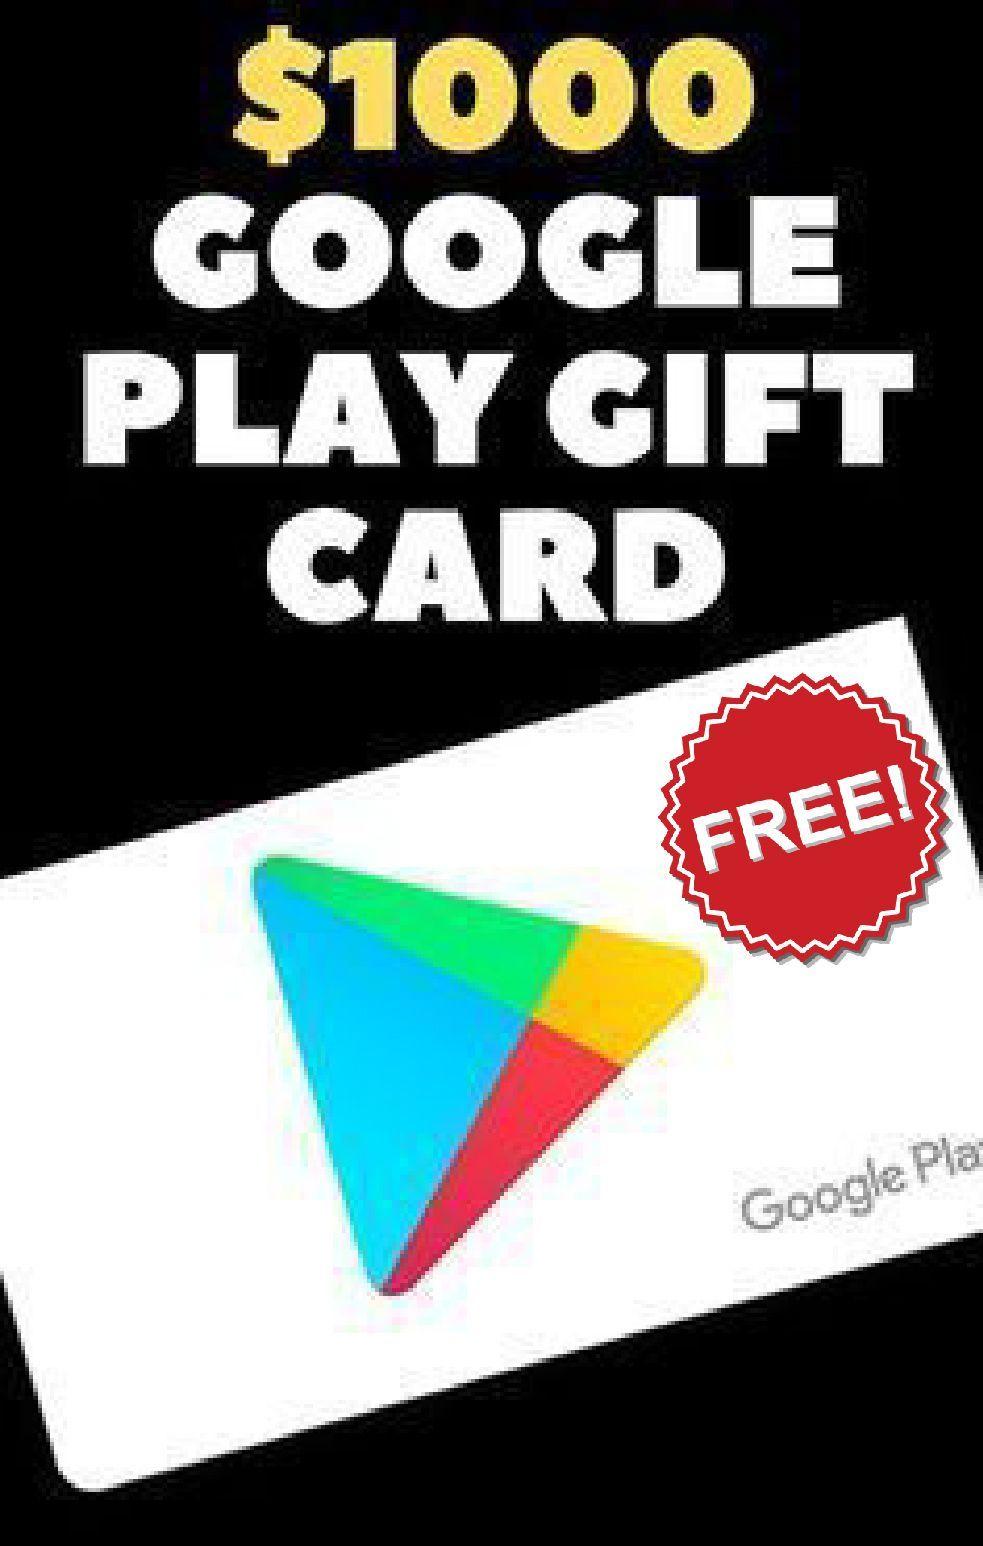 Pin on Free Google Play Gift Card Codes